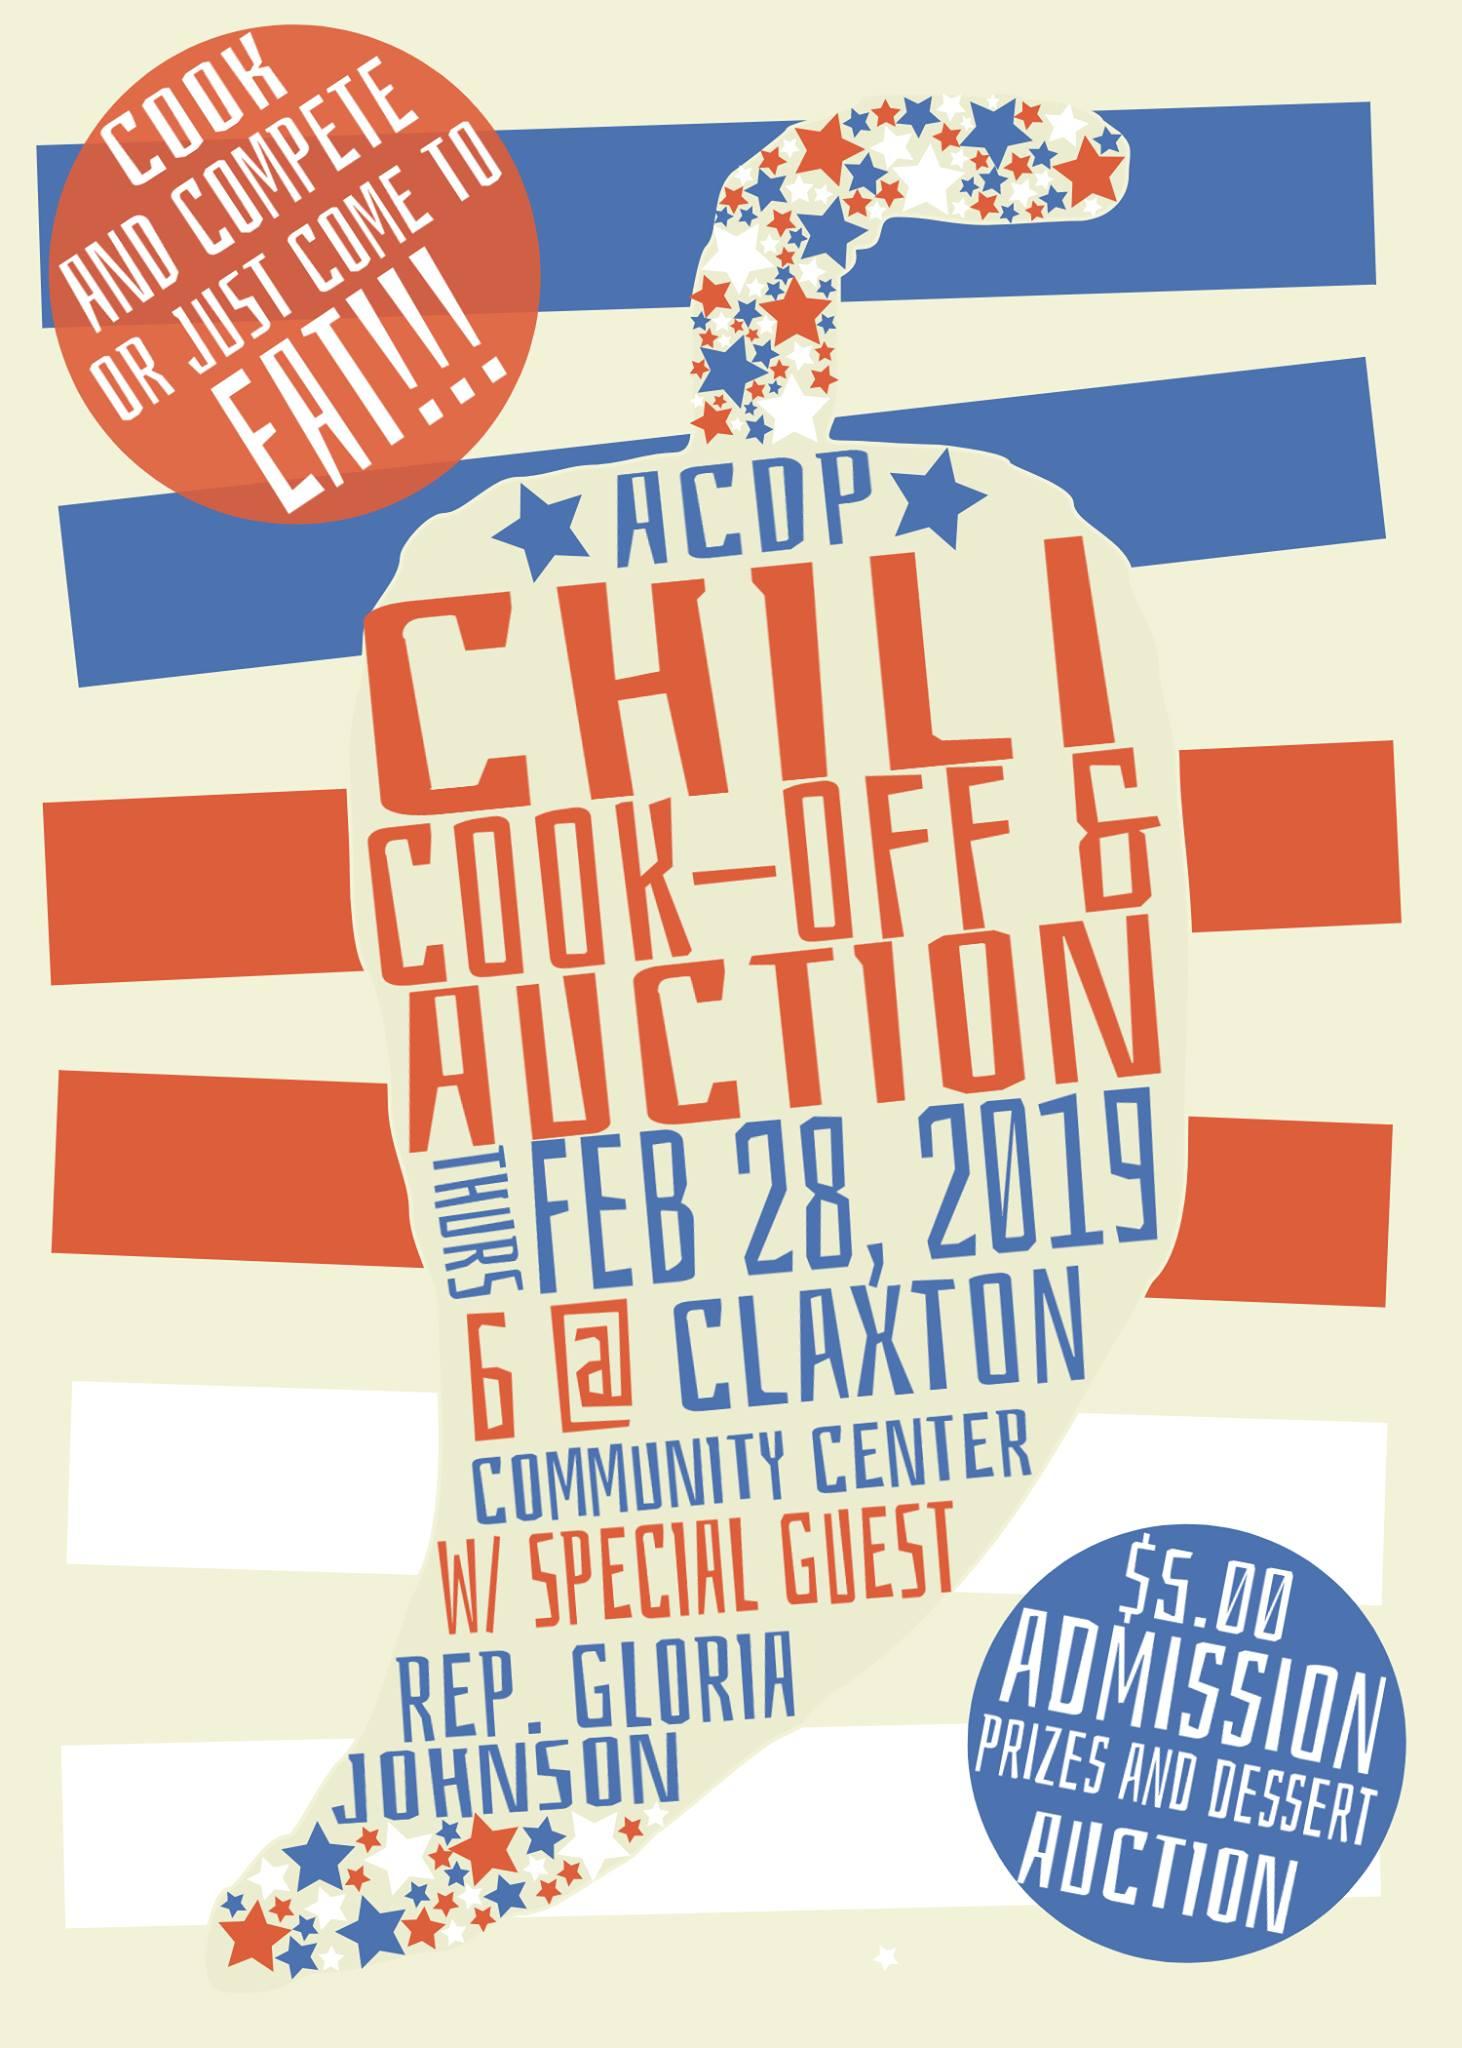 chili cook-off feb 2019.jpg